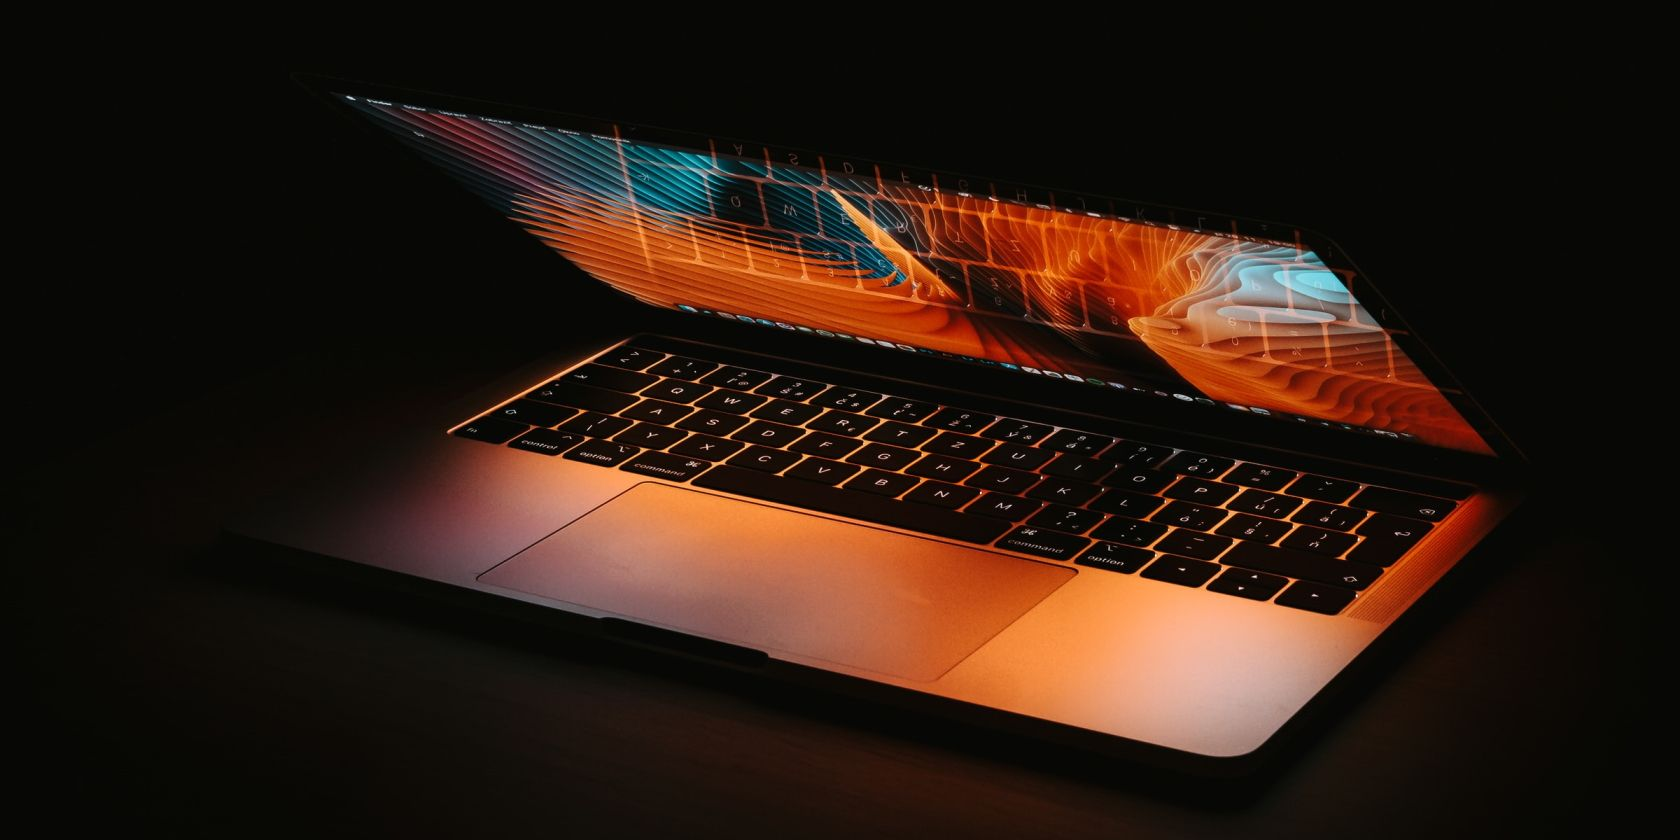 M1 MacBook Air vs. M1 MacBook Pro: Is It Worth Going Pro?